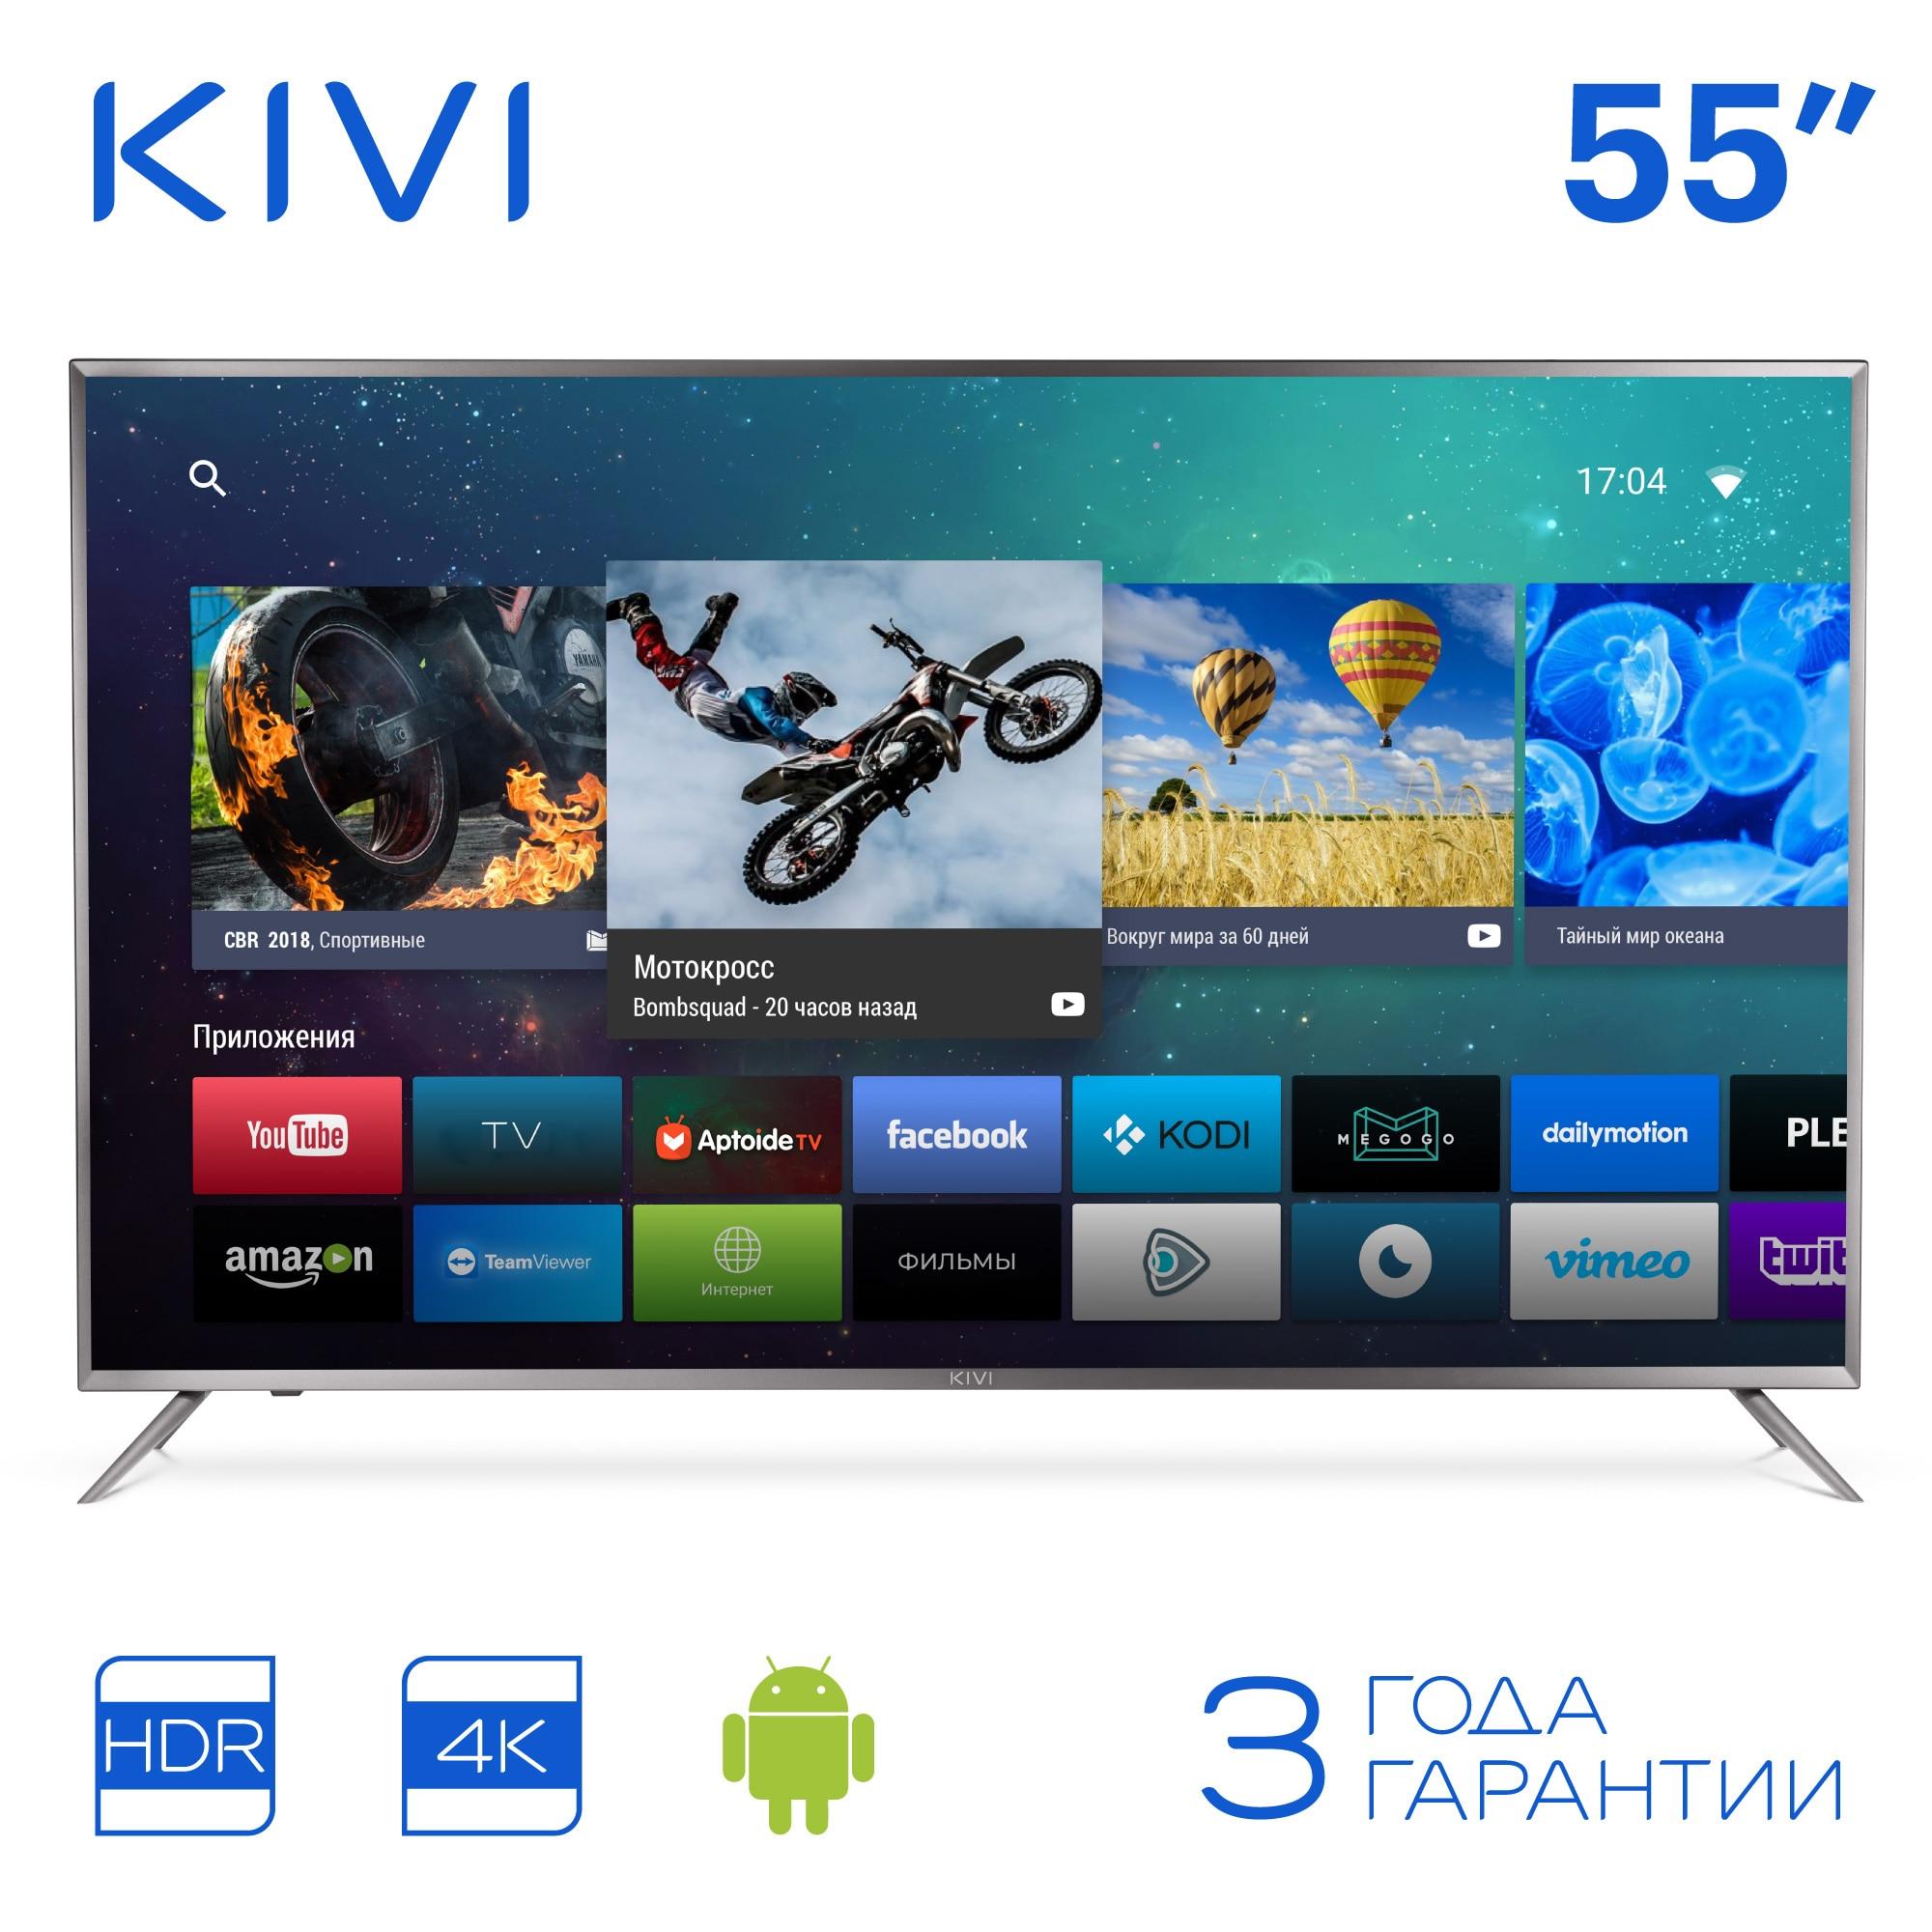 LED Television KIVI 55UR50GR UHD 4K Smart TV Android HDR 5055inchTV Digital Dvb Dvb-t Dvb-t2